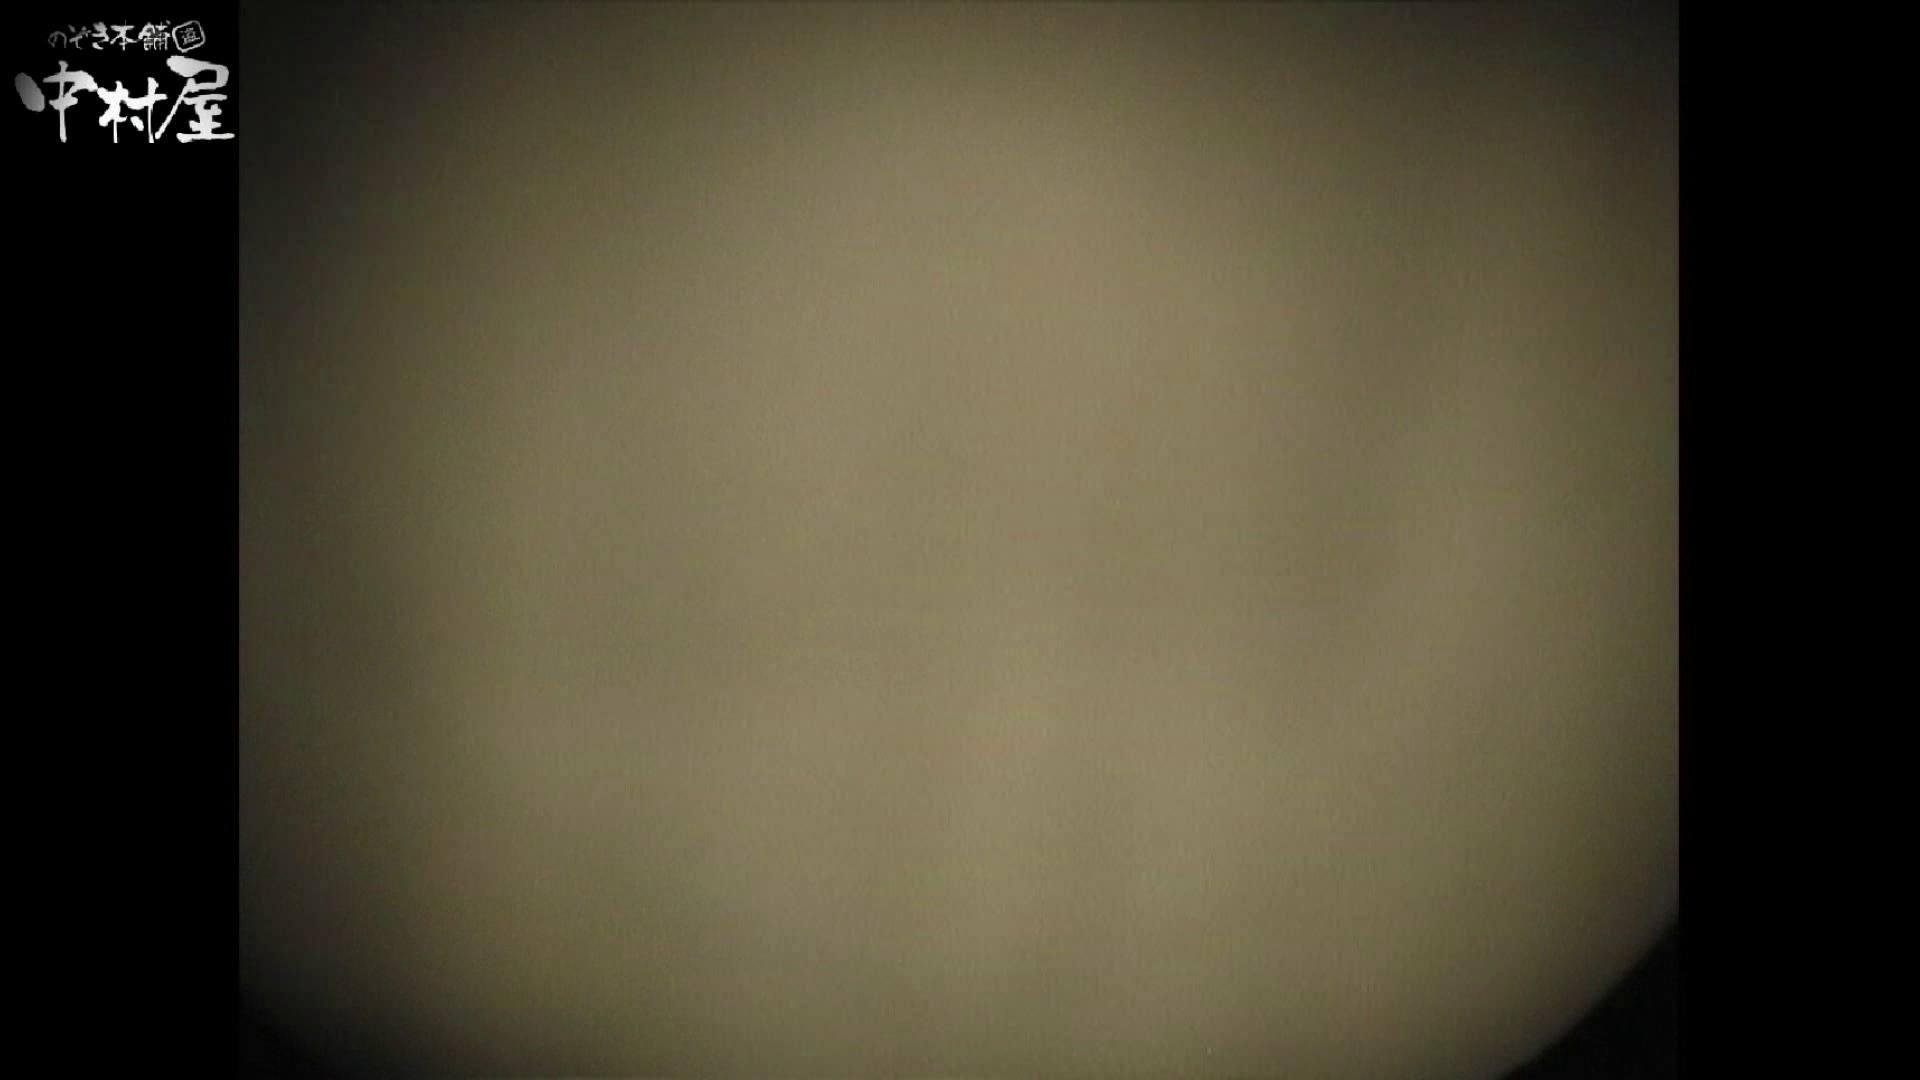 No.32 脇とVラインの処理が甘い貧乳ギャル、タンポンの紐がぶらぶら 接写 | ギャルのエロ動画  75PIX 52